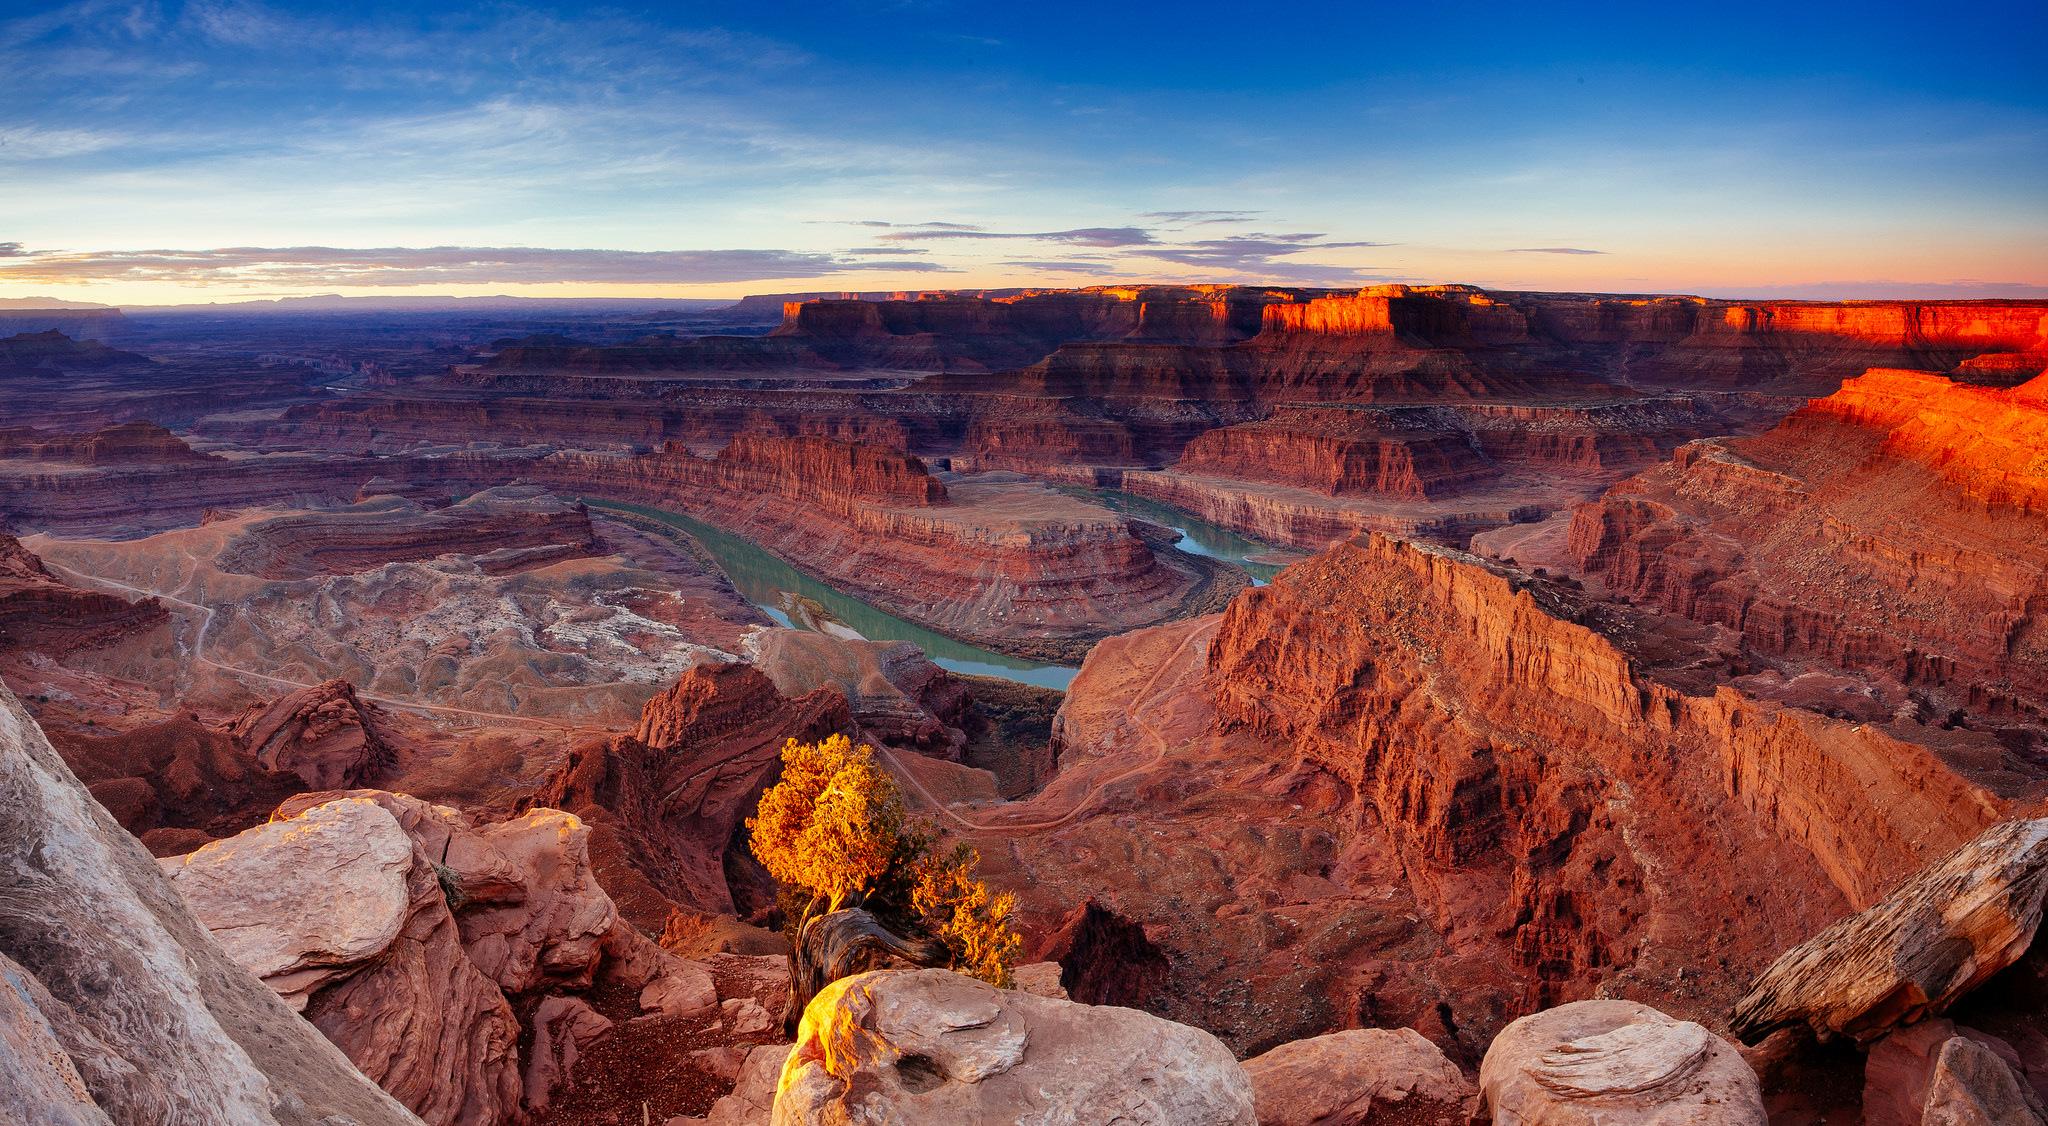 Wallpaper canyonlands national park utah usa wallpapers landscapes 2048x1126